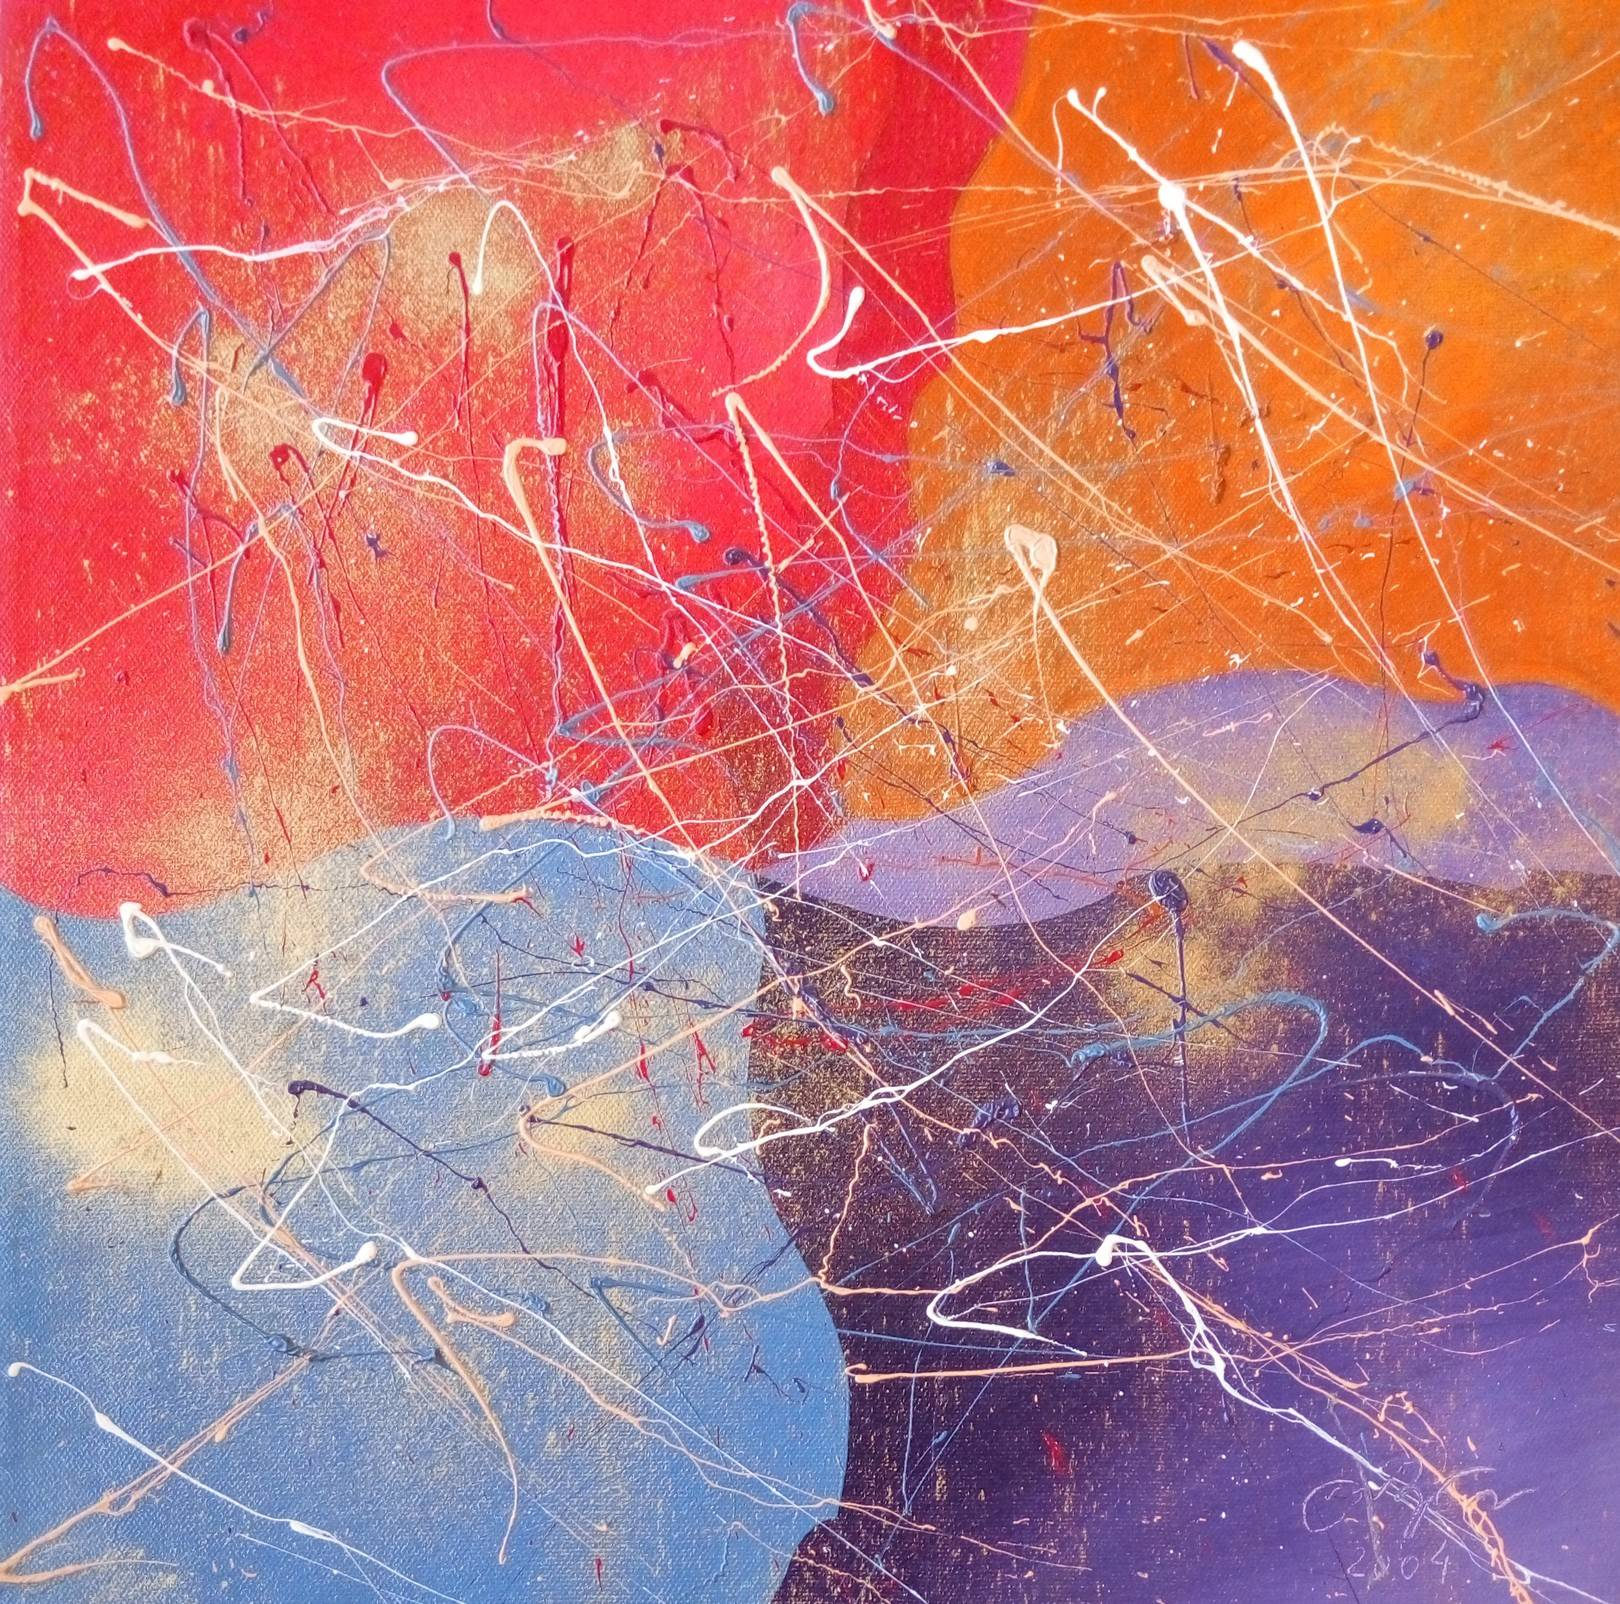 «В ожидании лета»                     холст, масло «Waiting for summer»                 oil on canvas                                               40x40,  2003